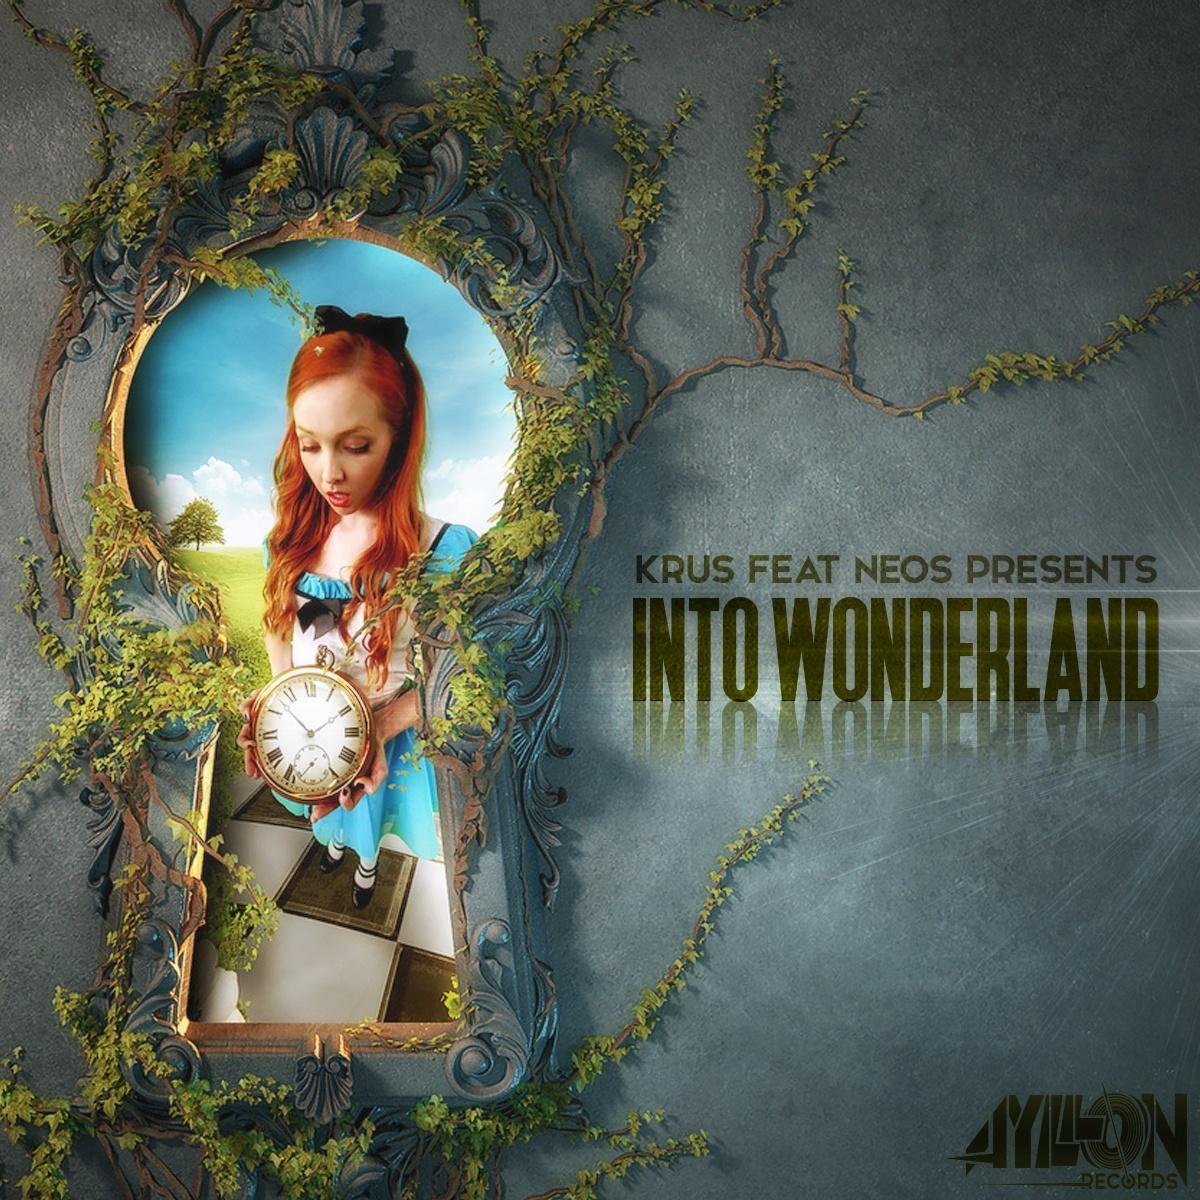 Krus Ft. Neos - Into Wonderland (Makina Remix) [AR001]